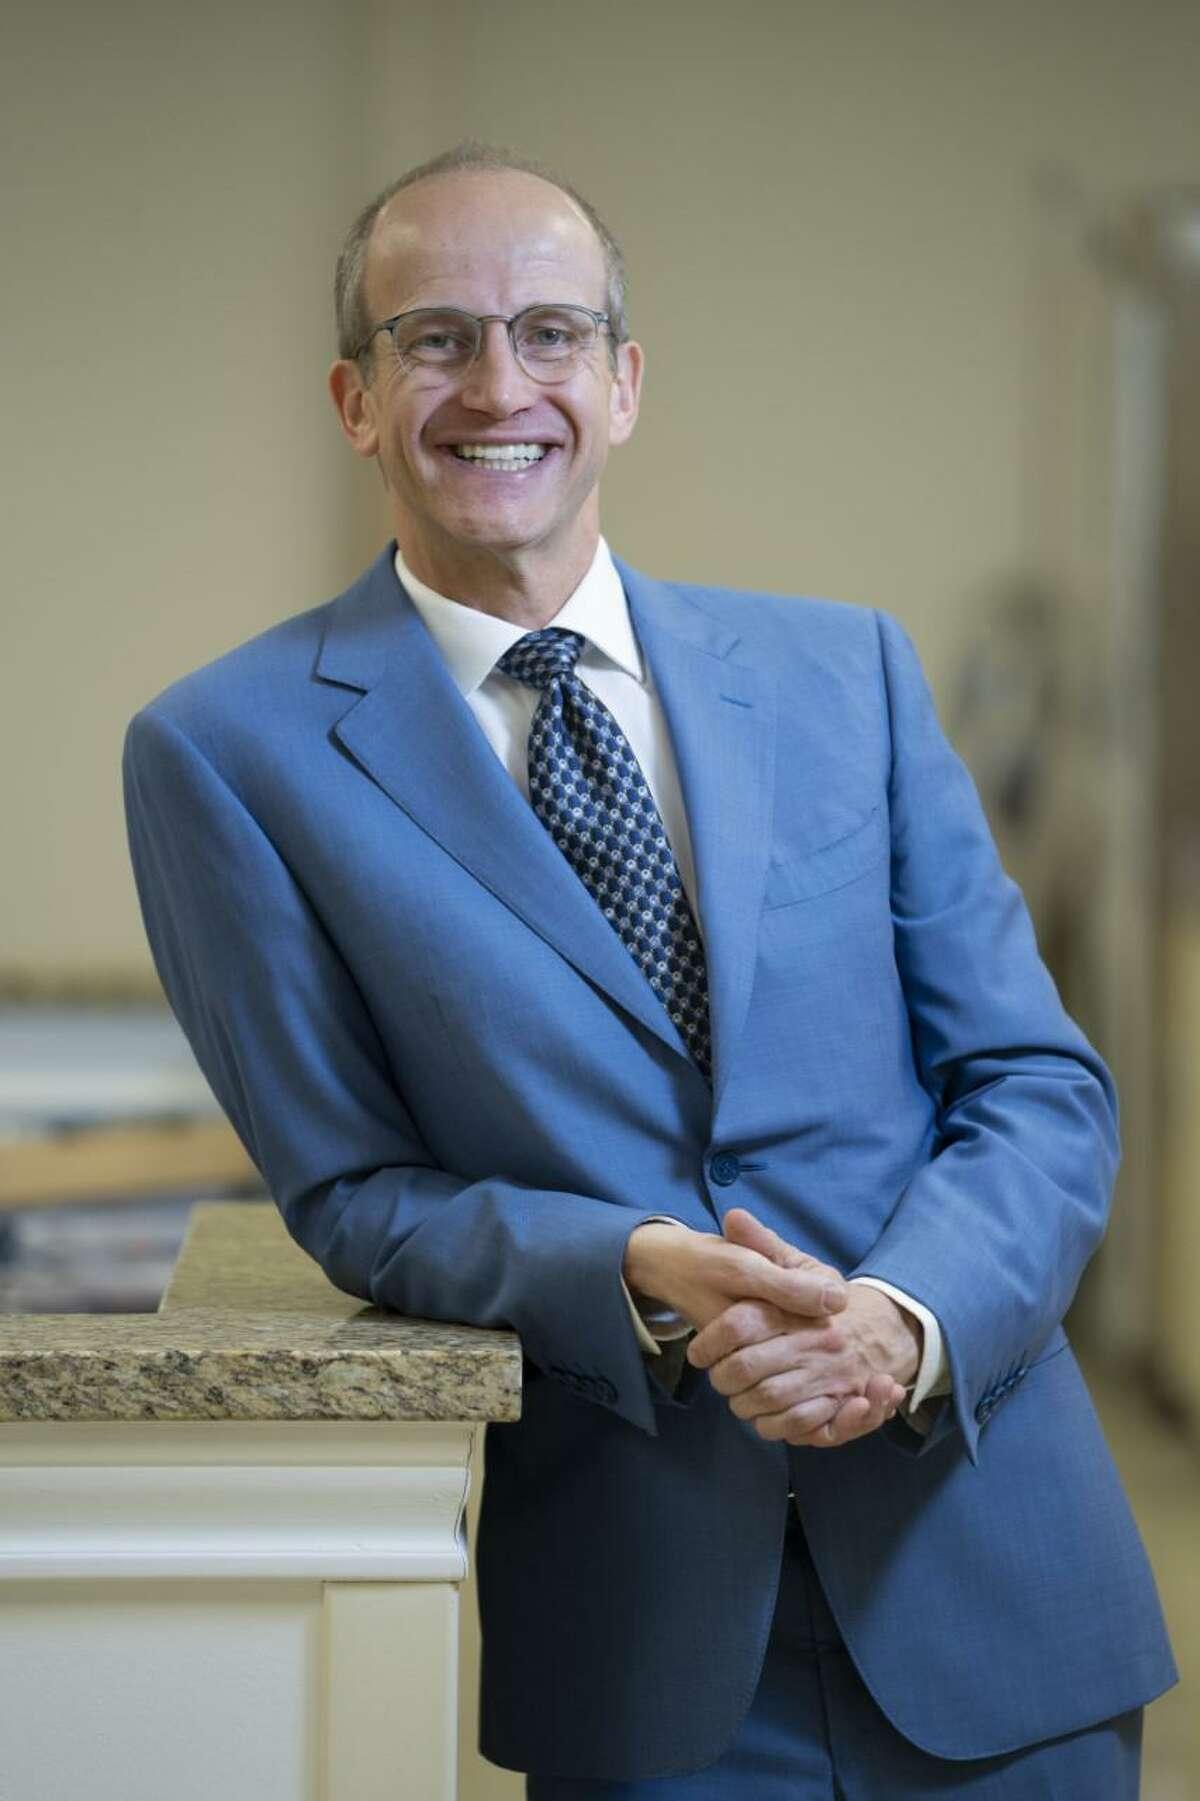 Dr. Michael A. Hochman